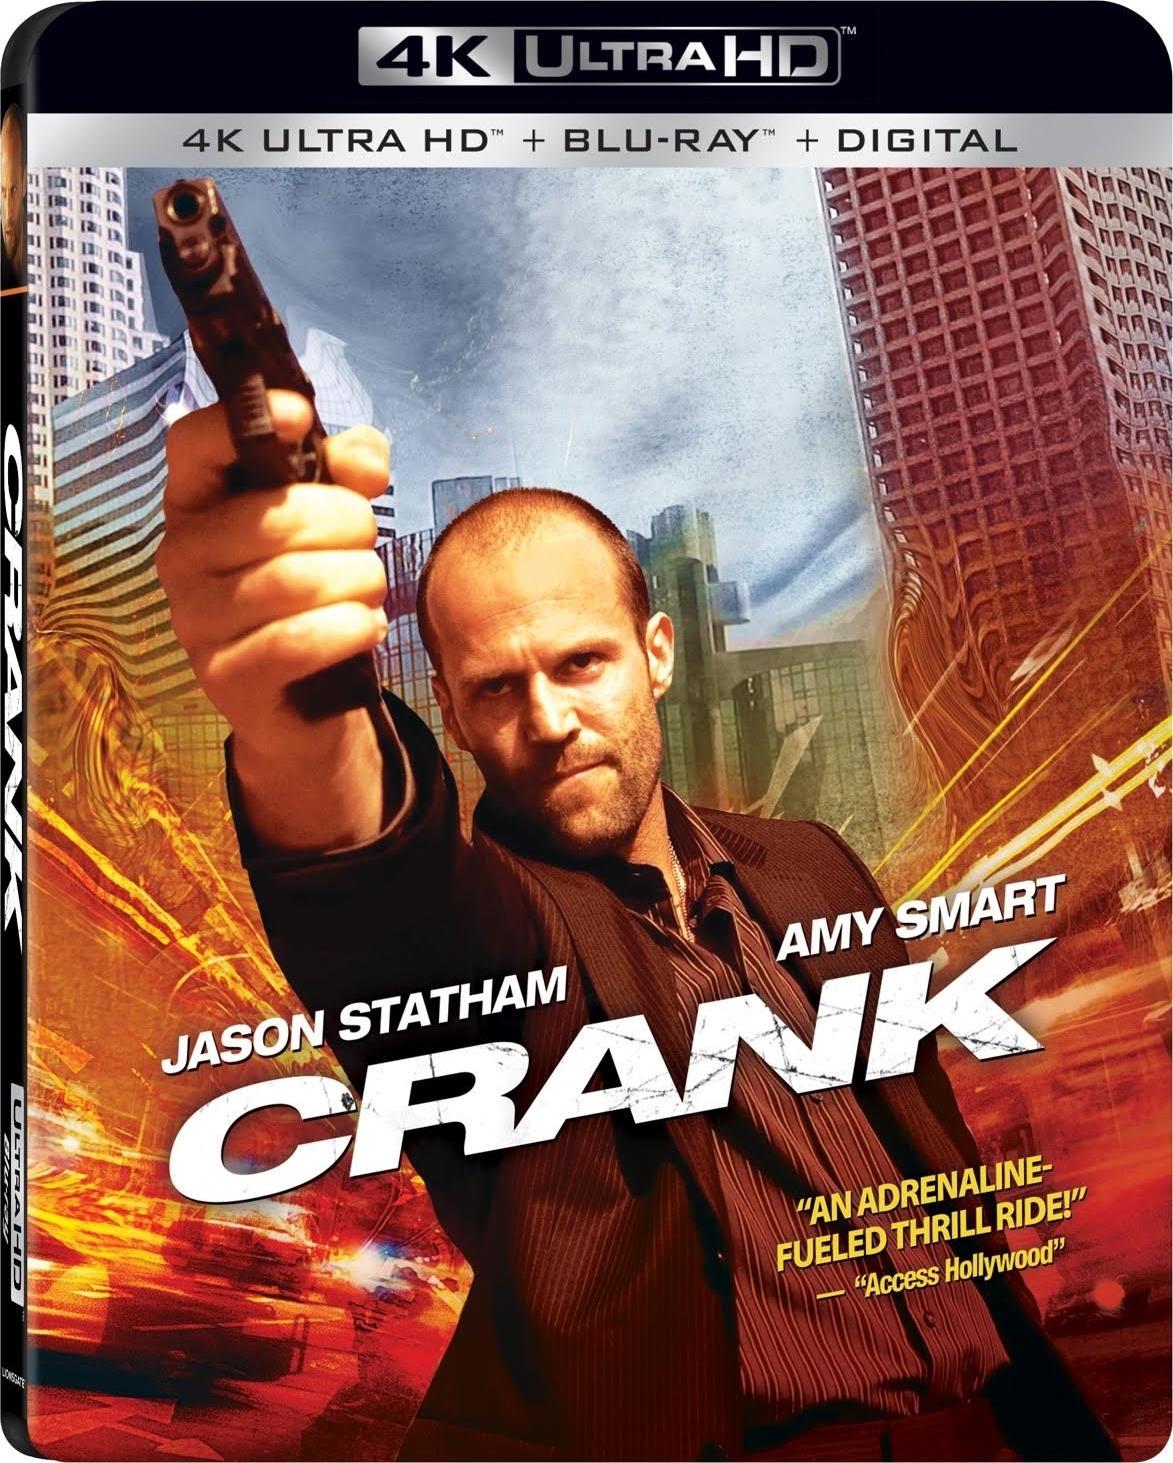 Crank (4K Ultra HD Blu-ray)(Pre-order / May 21)